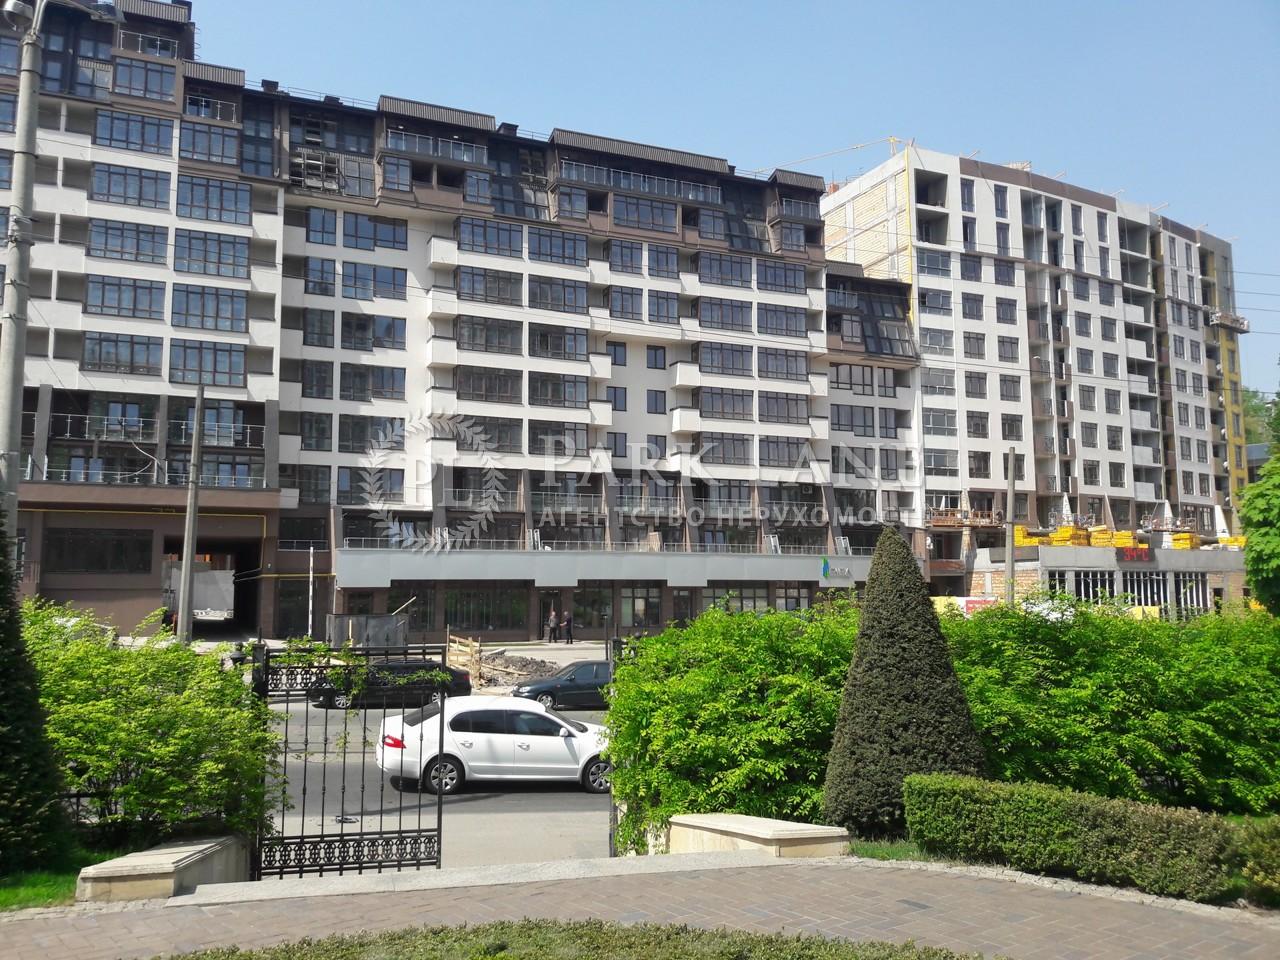 Lvivskyi Kvartal